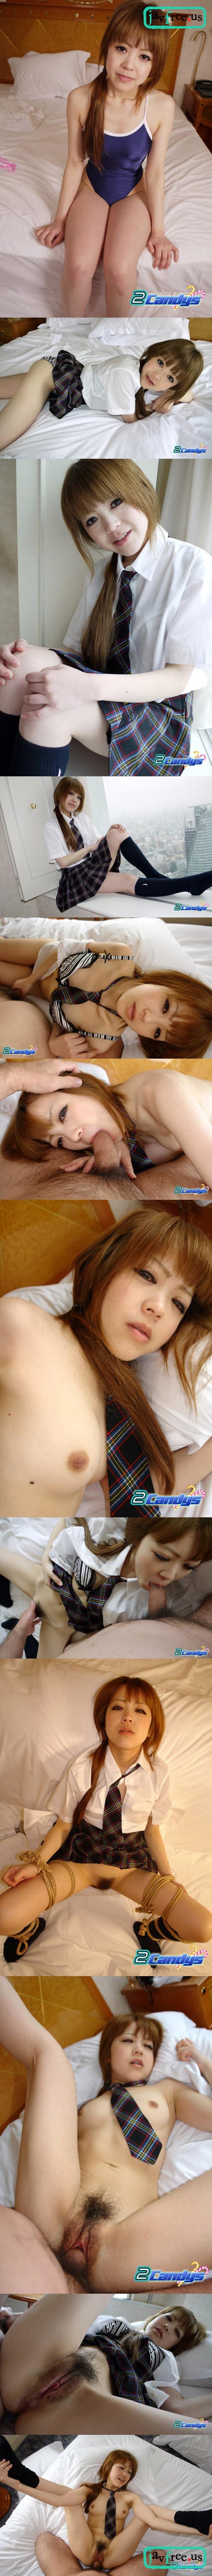 2candys.com 110692 TUKASA   猥褻撮影会 08 ~制服ワイセツ~ 2Candys